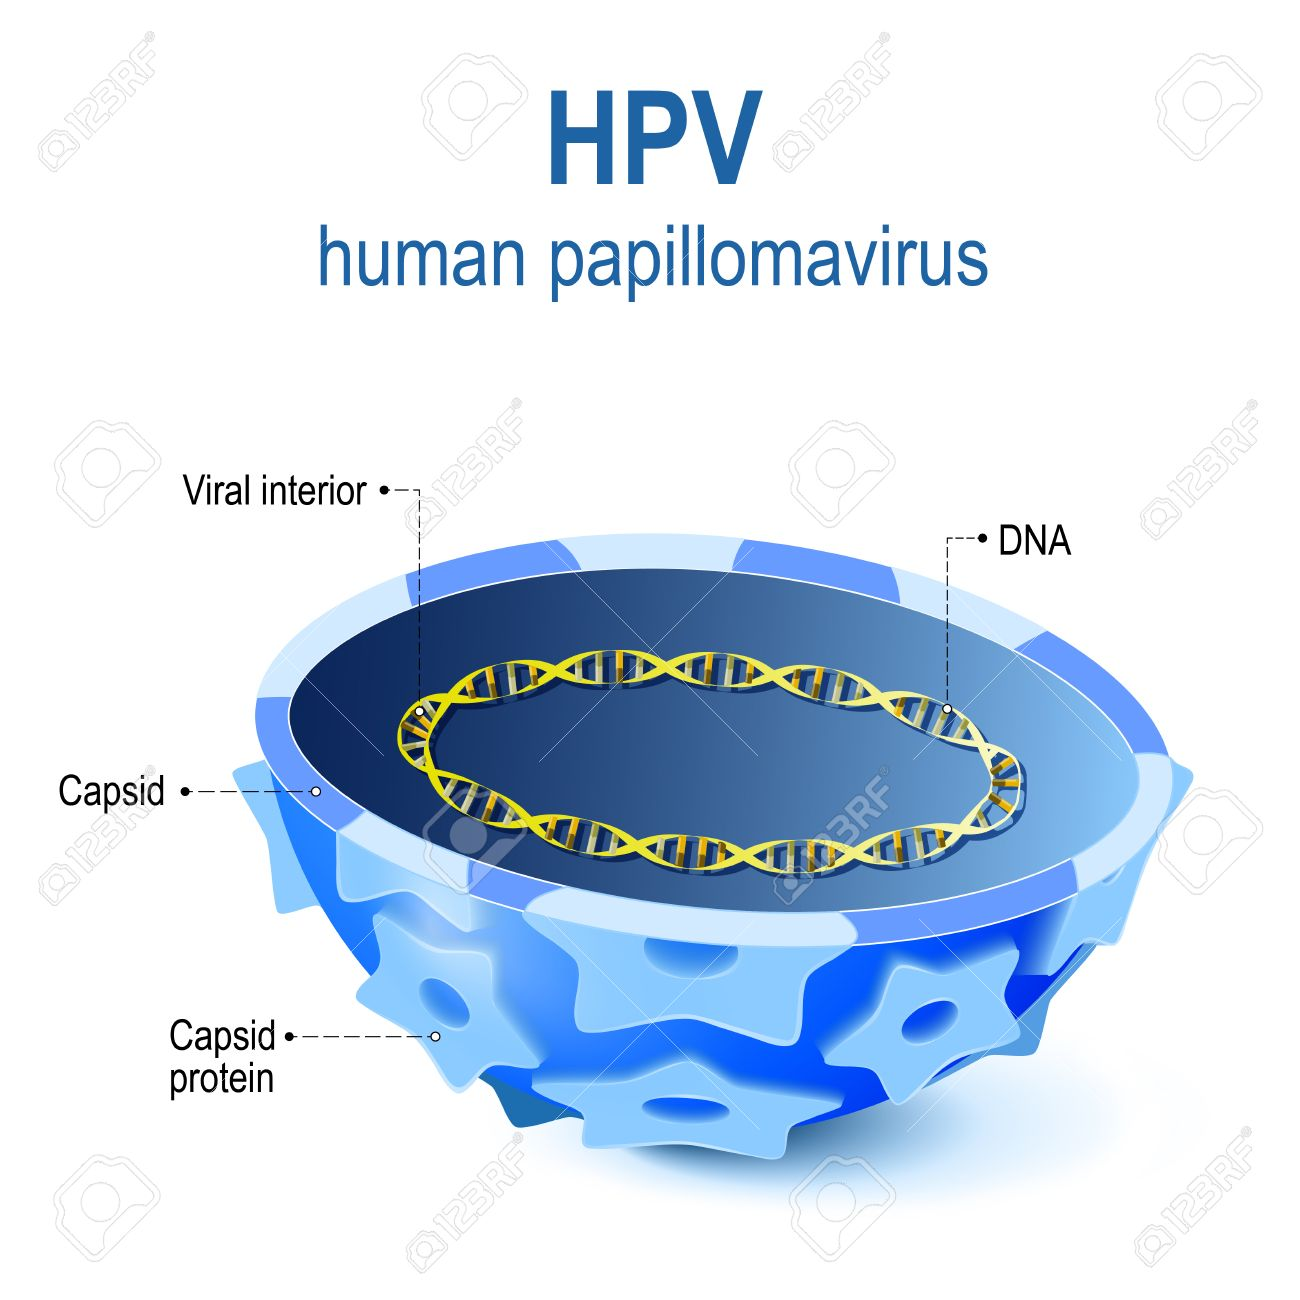 paraziti kod macaka virus papiloma humano sin tener relaciones